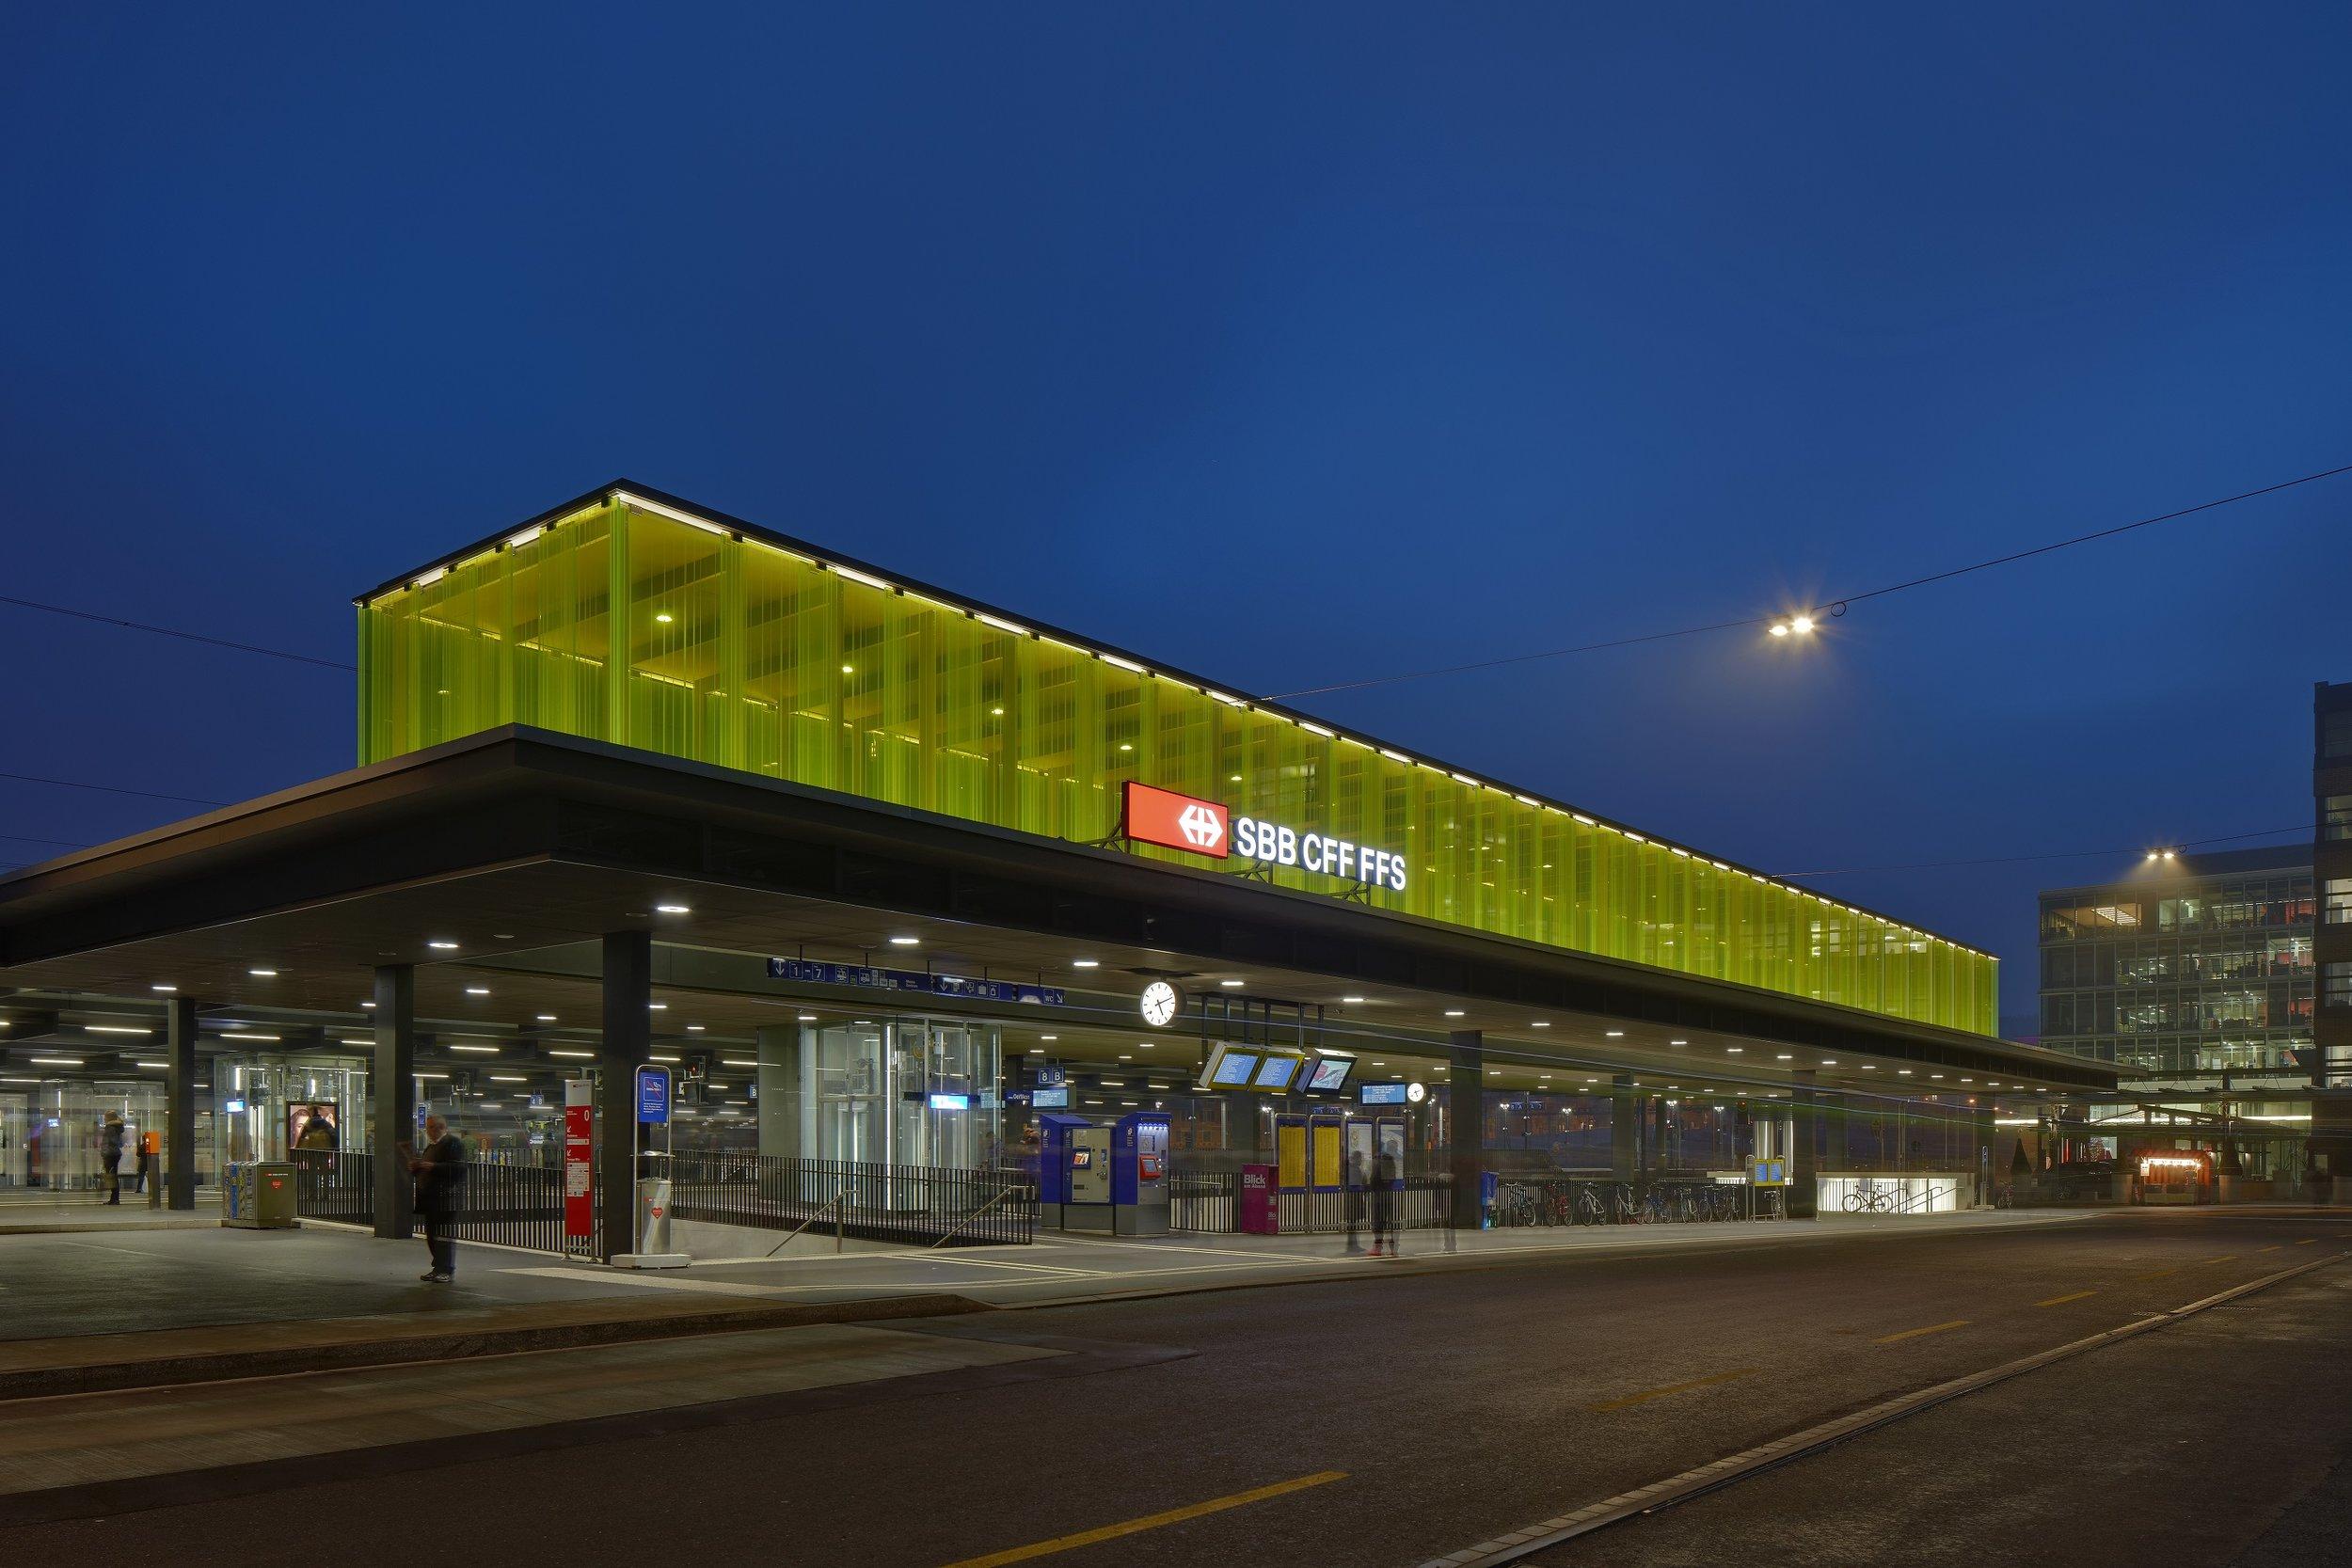 Bahnhof _Oerlikon_38.JPG